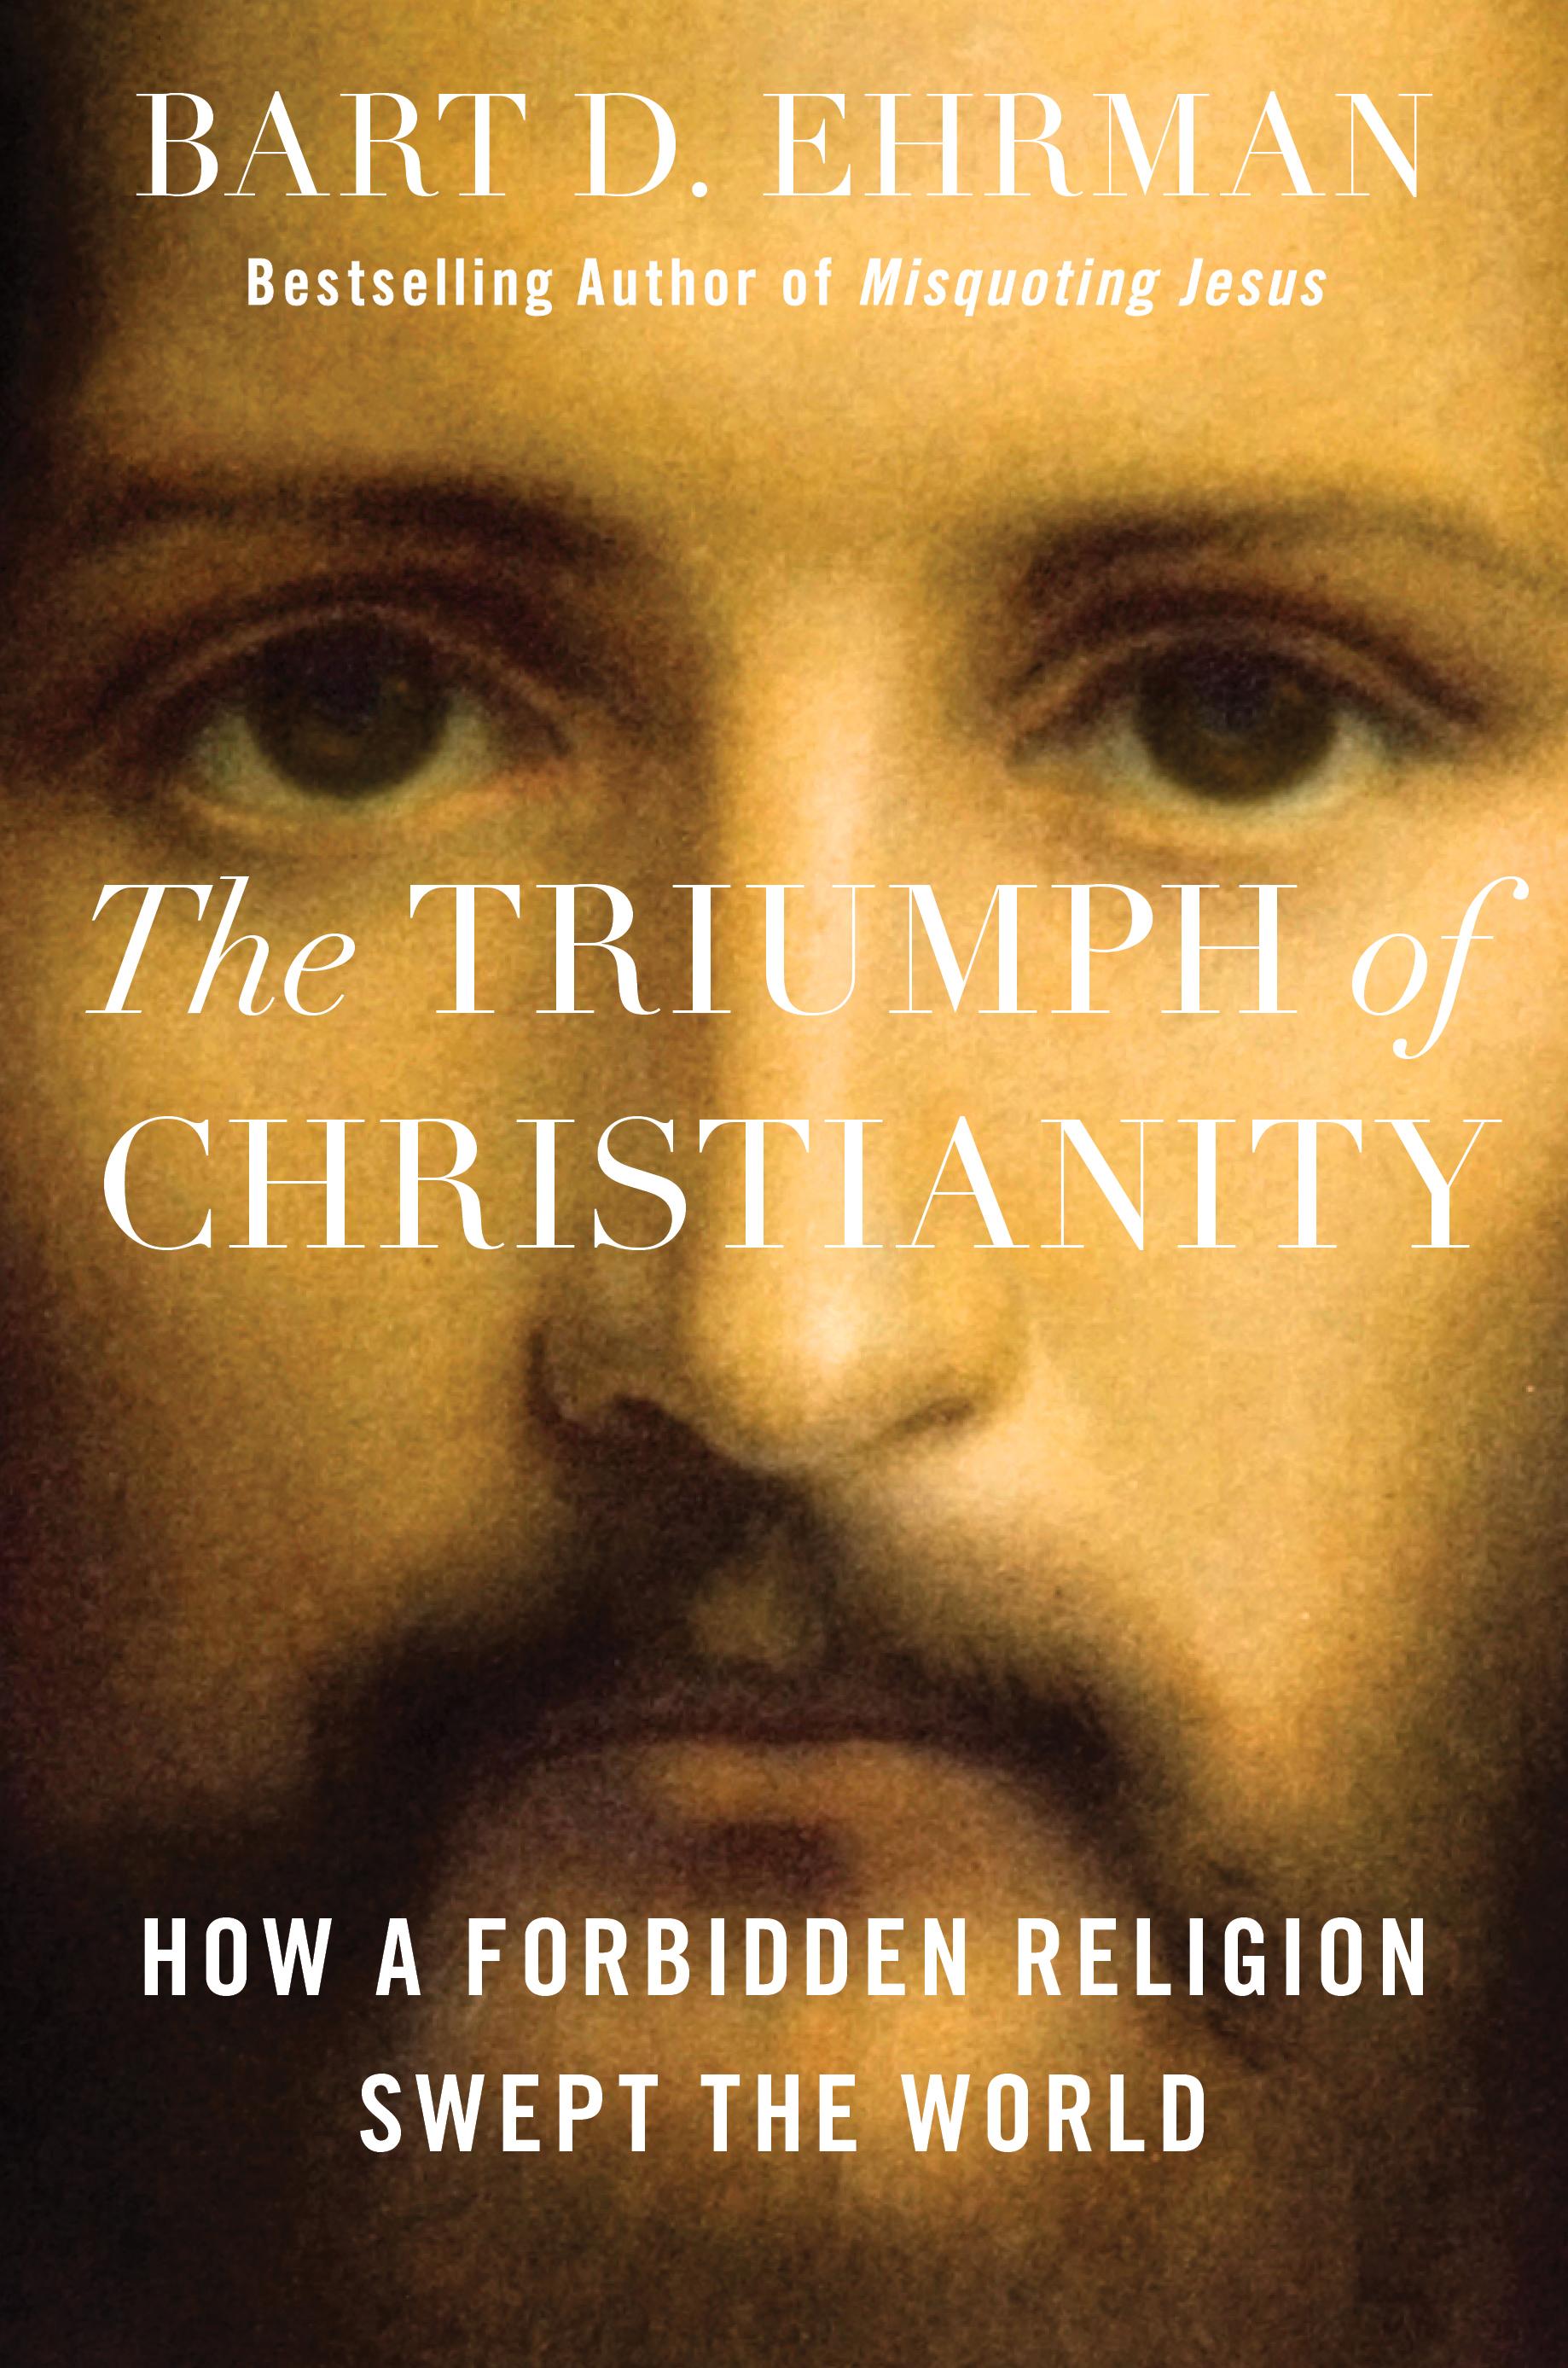 Bart Ehrman book cover